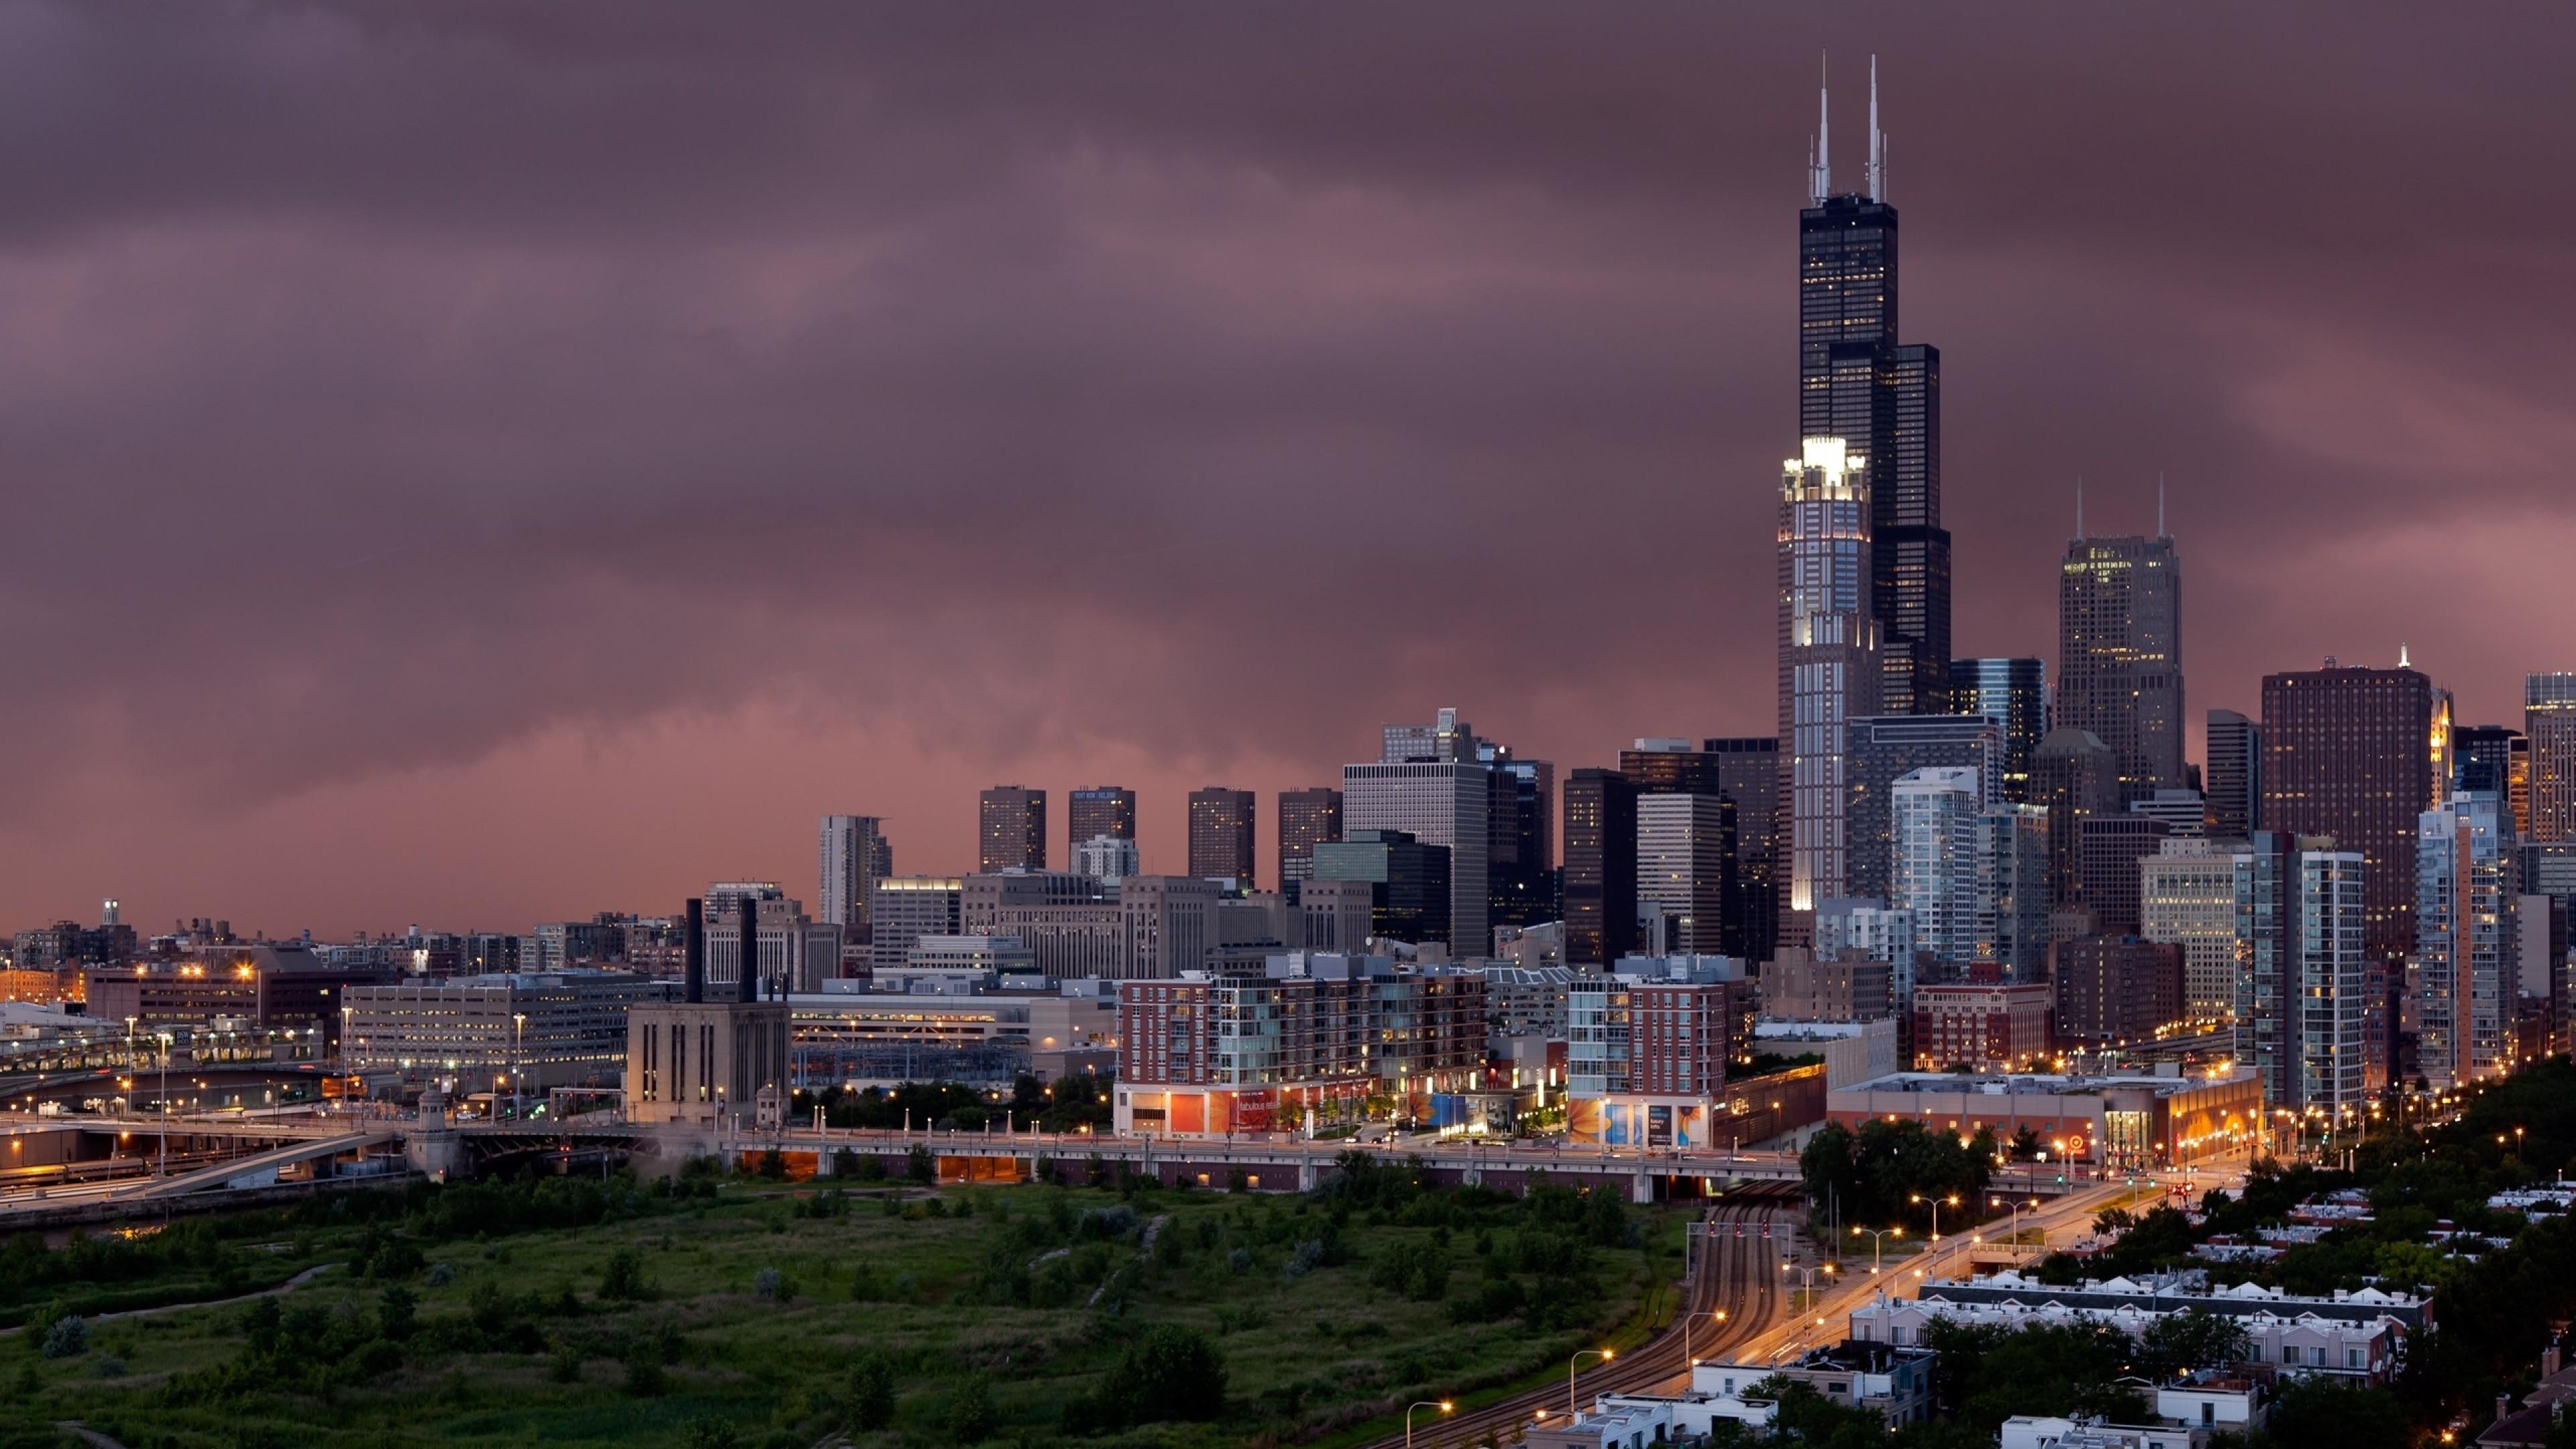 Wallpaper chicago, evening, city, buildings, skyscrapers